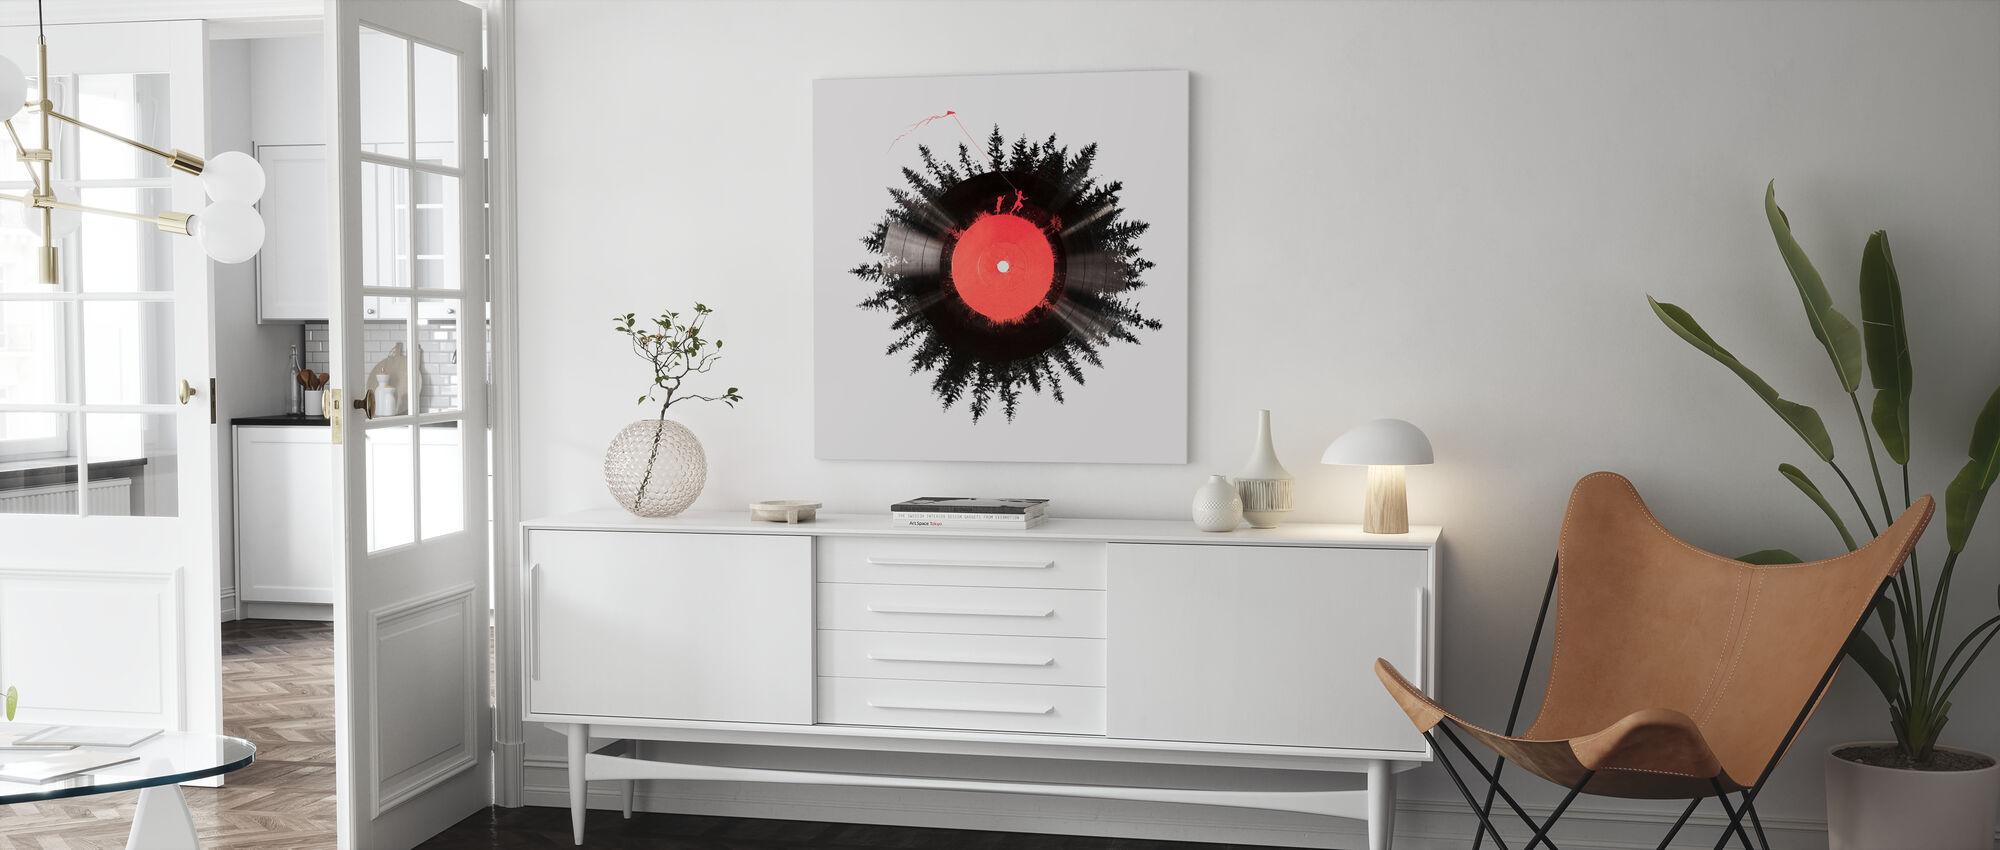 The Vinyl of my Life - Canvas print - Living Room